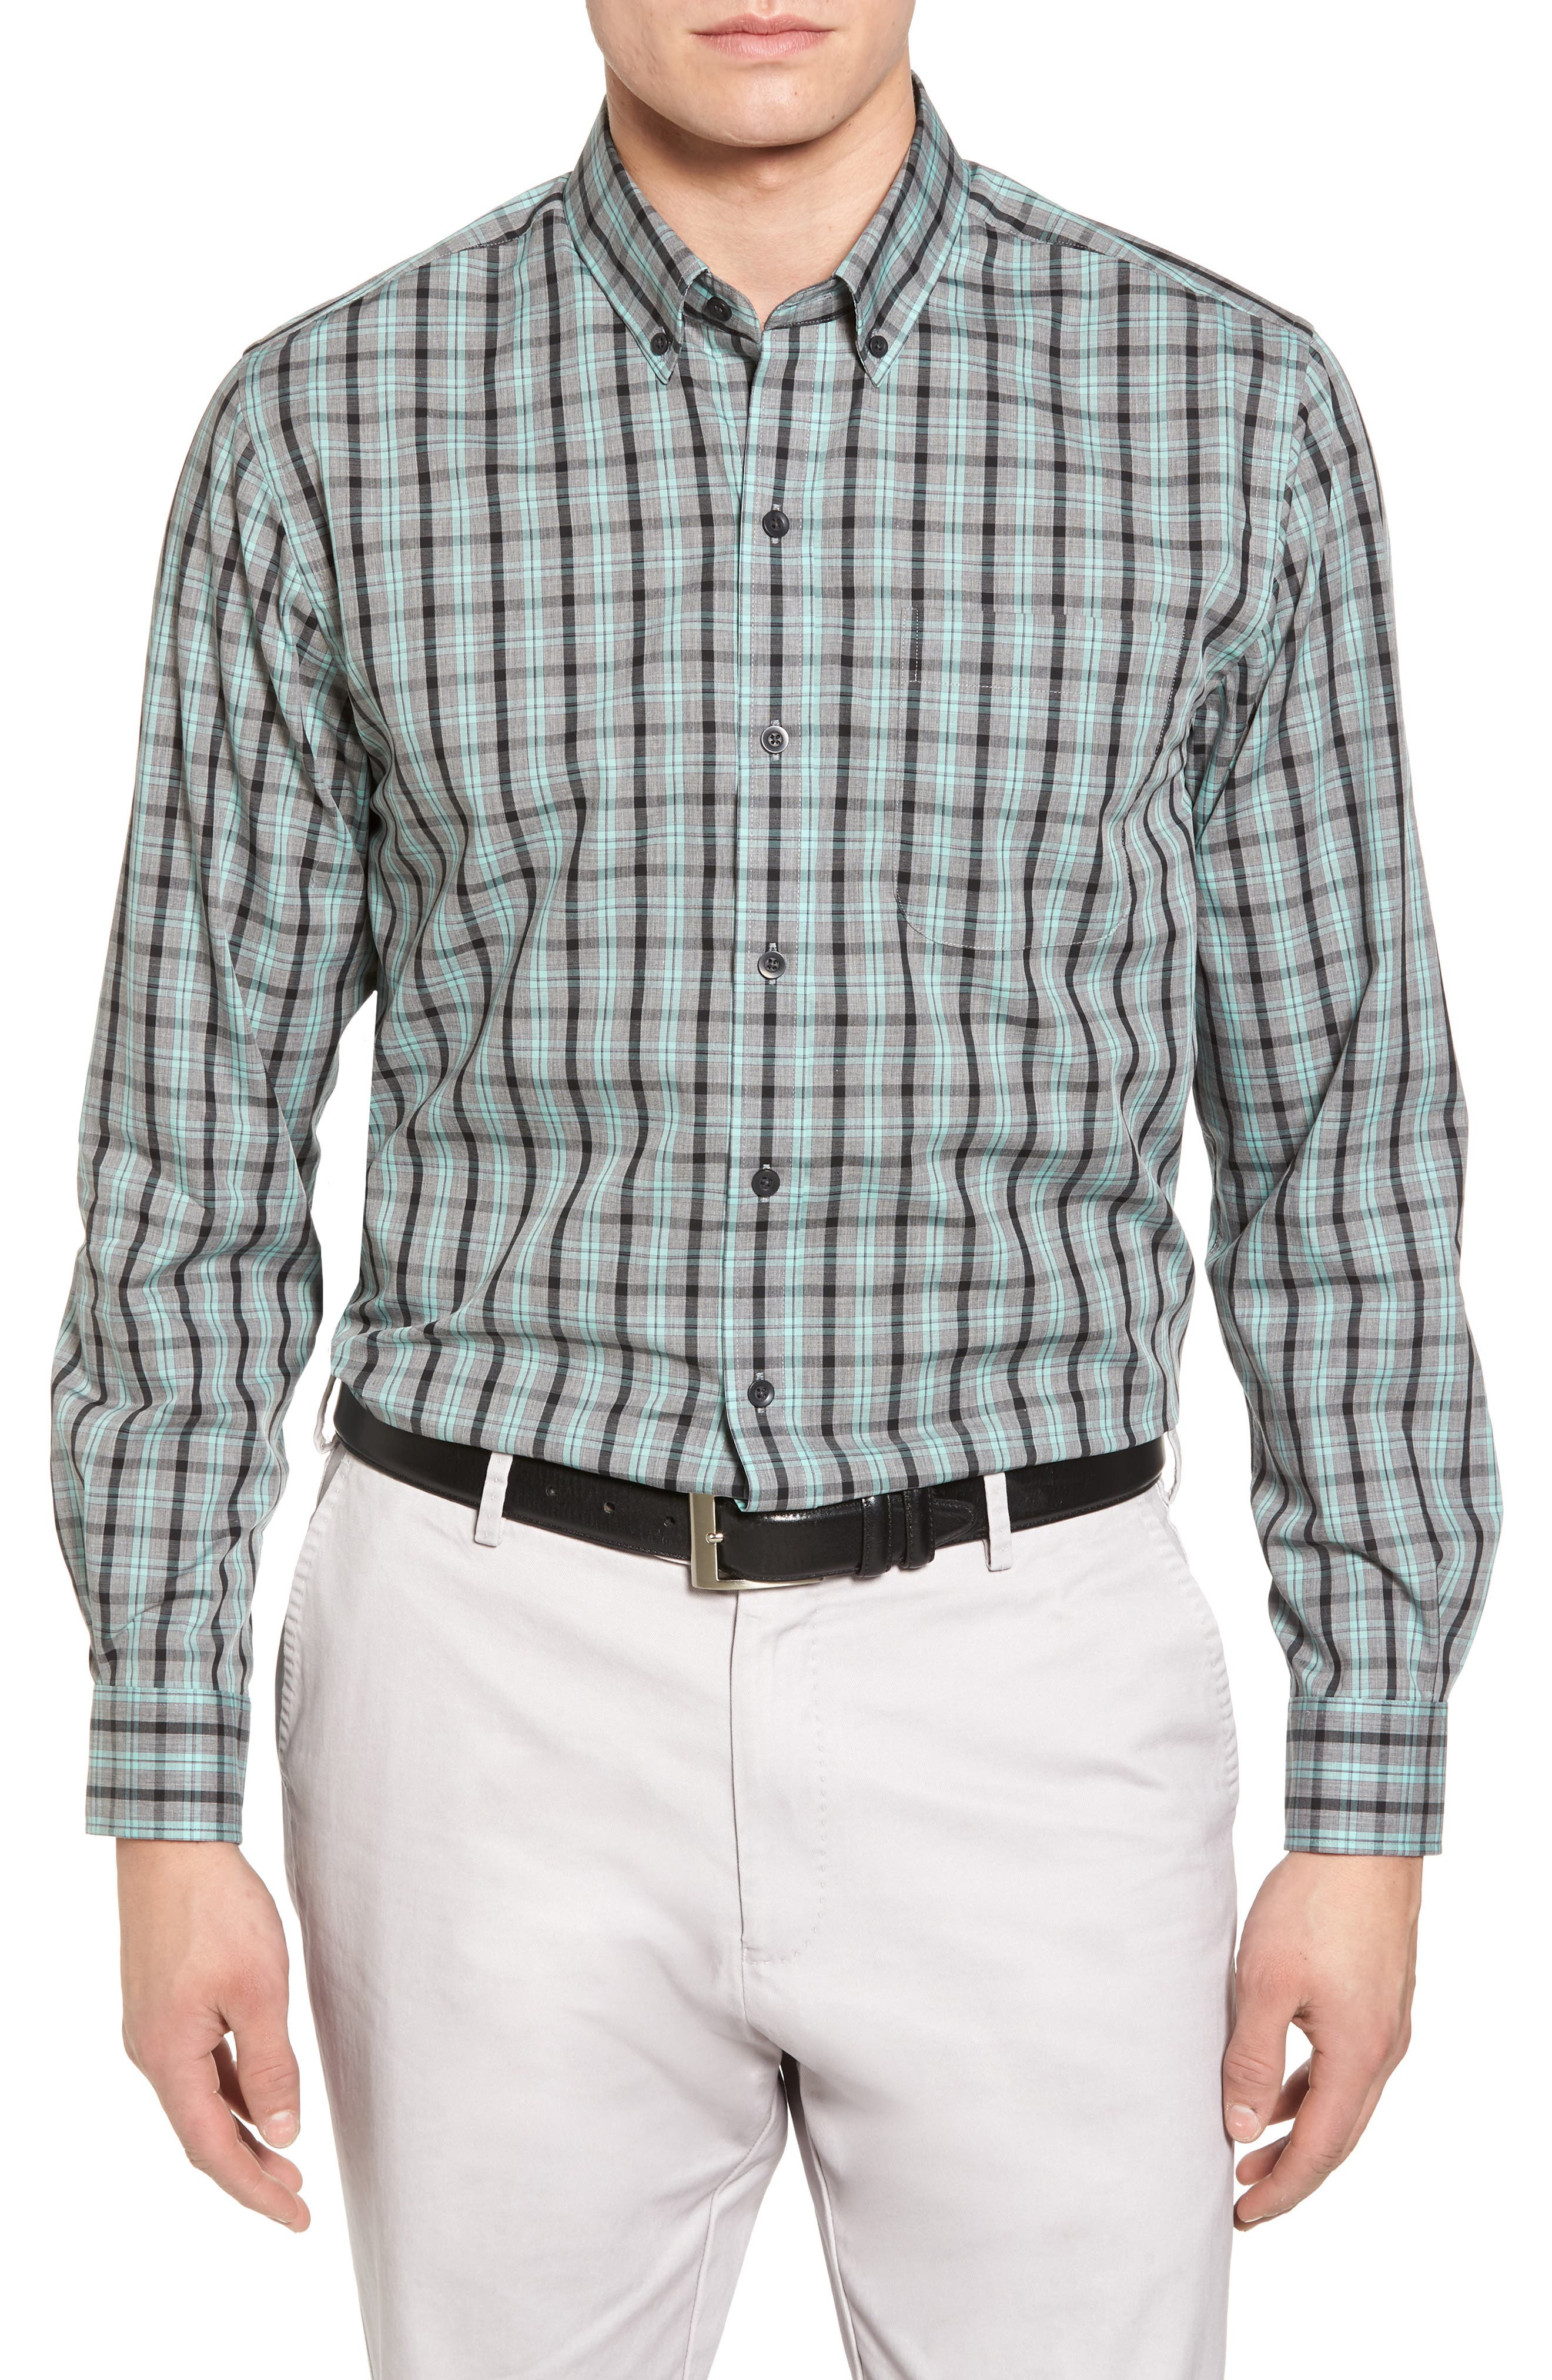 Davis Non-Iron Plaid Sport Shirt,                             Main thumbnail 1, color,                             Aquastone